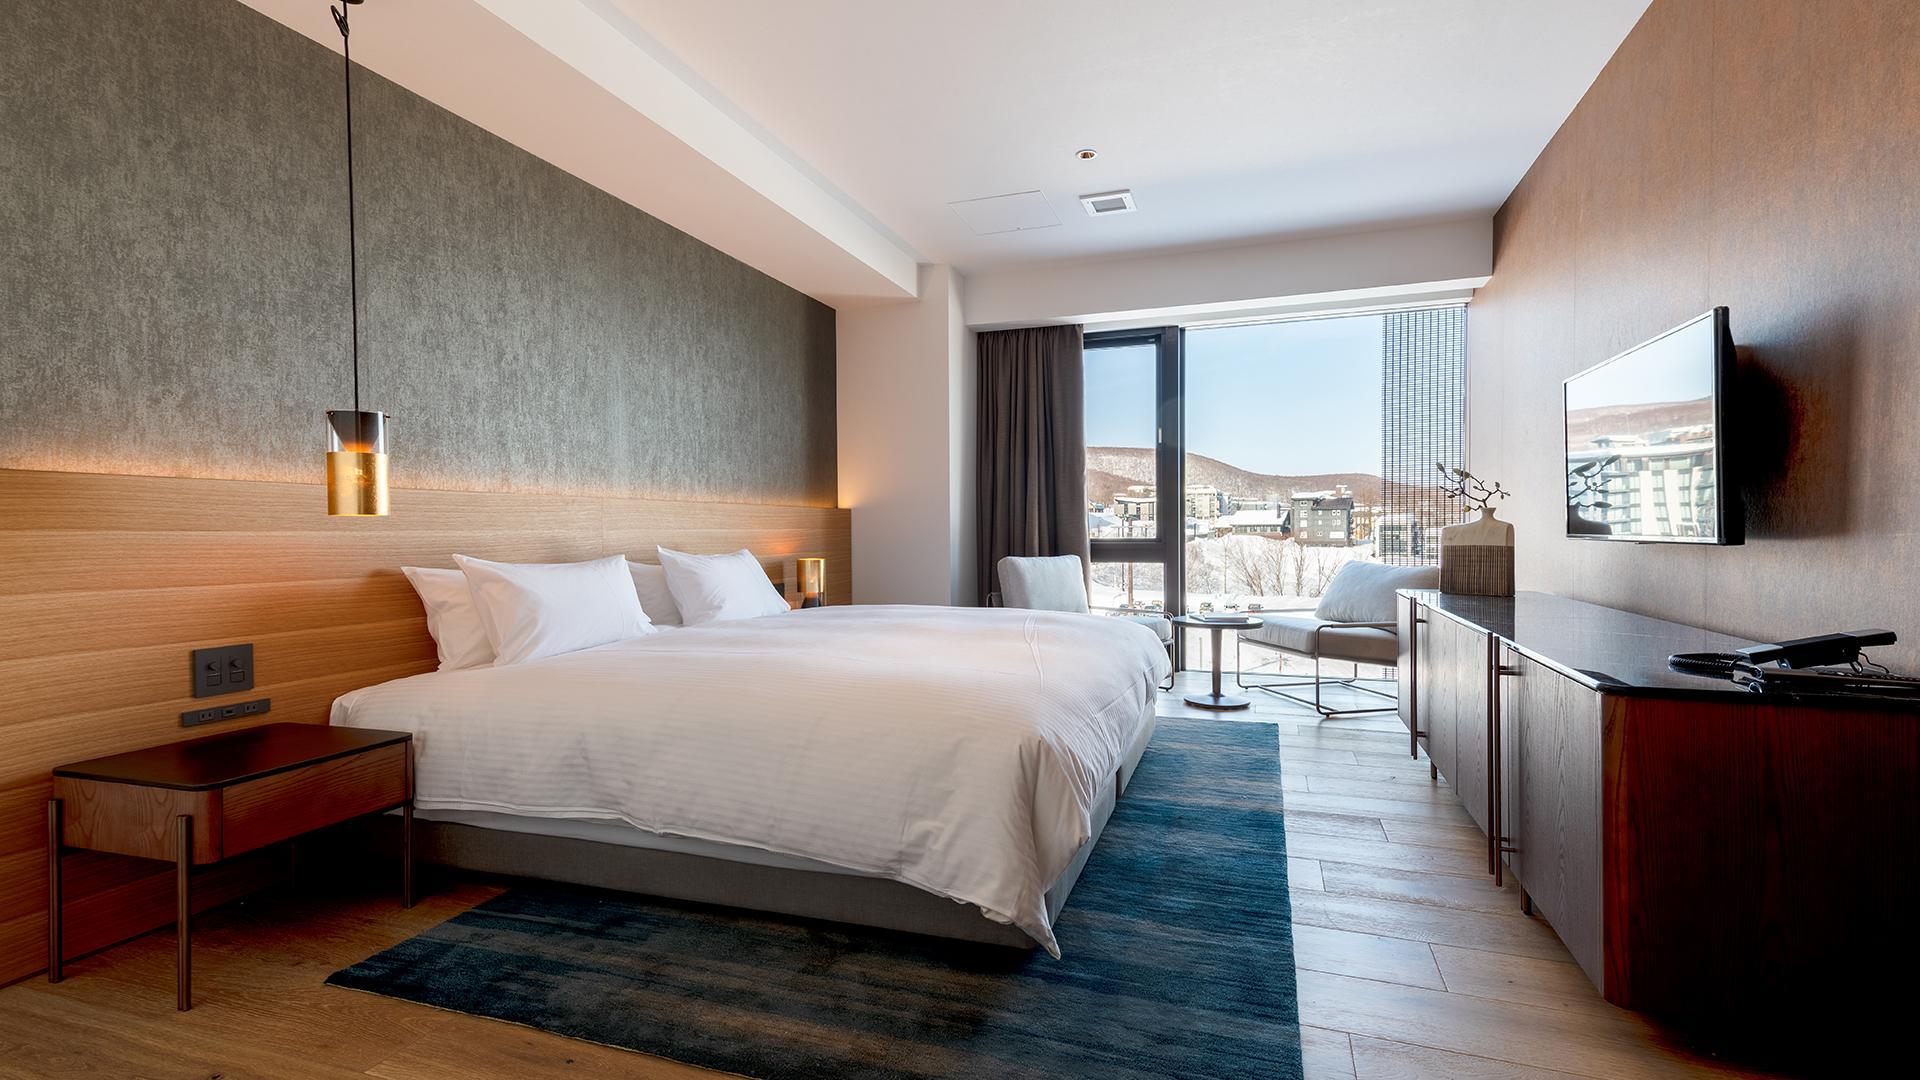 Resort Hotel Room image 1 at Intuition Niseko by Abuta District, Hokkaido, Japan